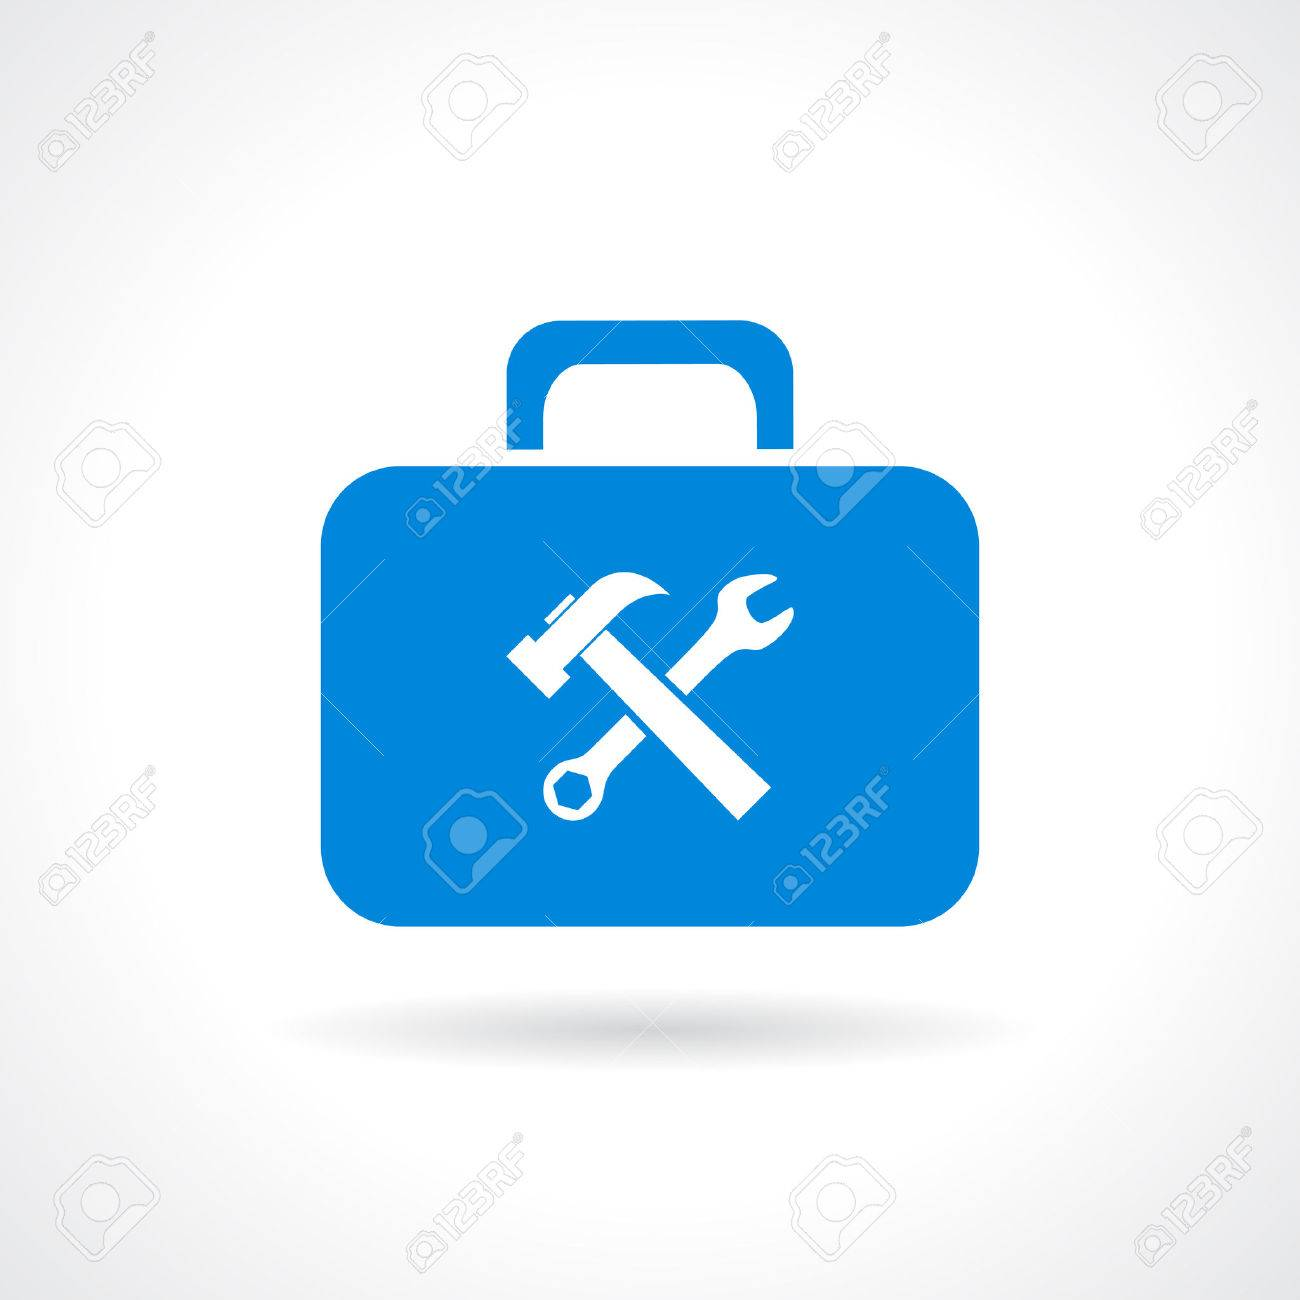 Tools chest icon - 53258118